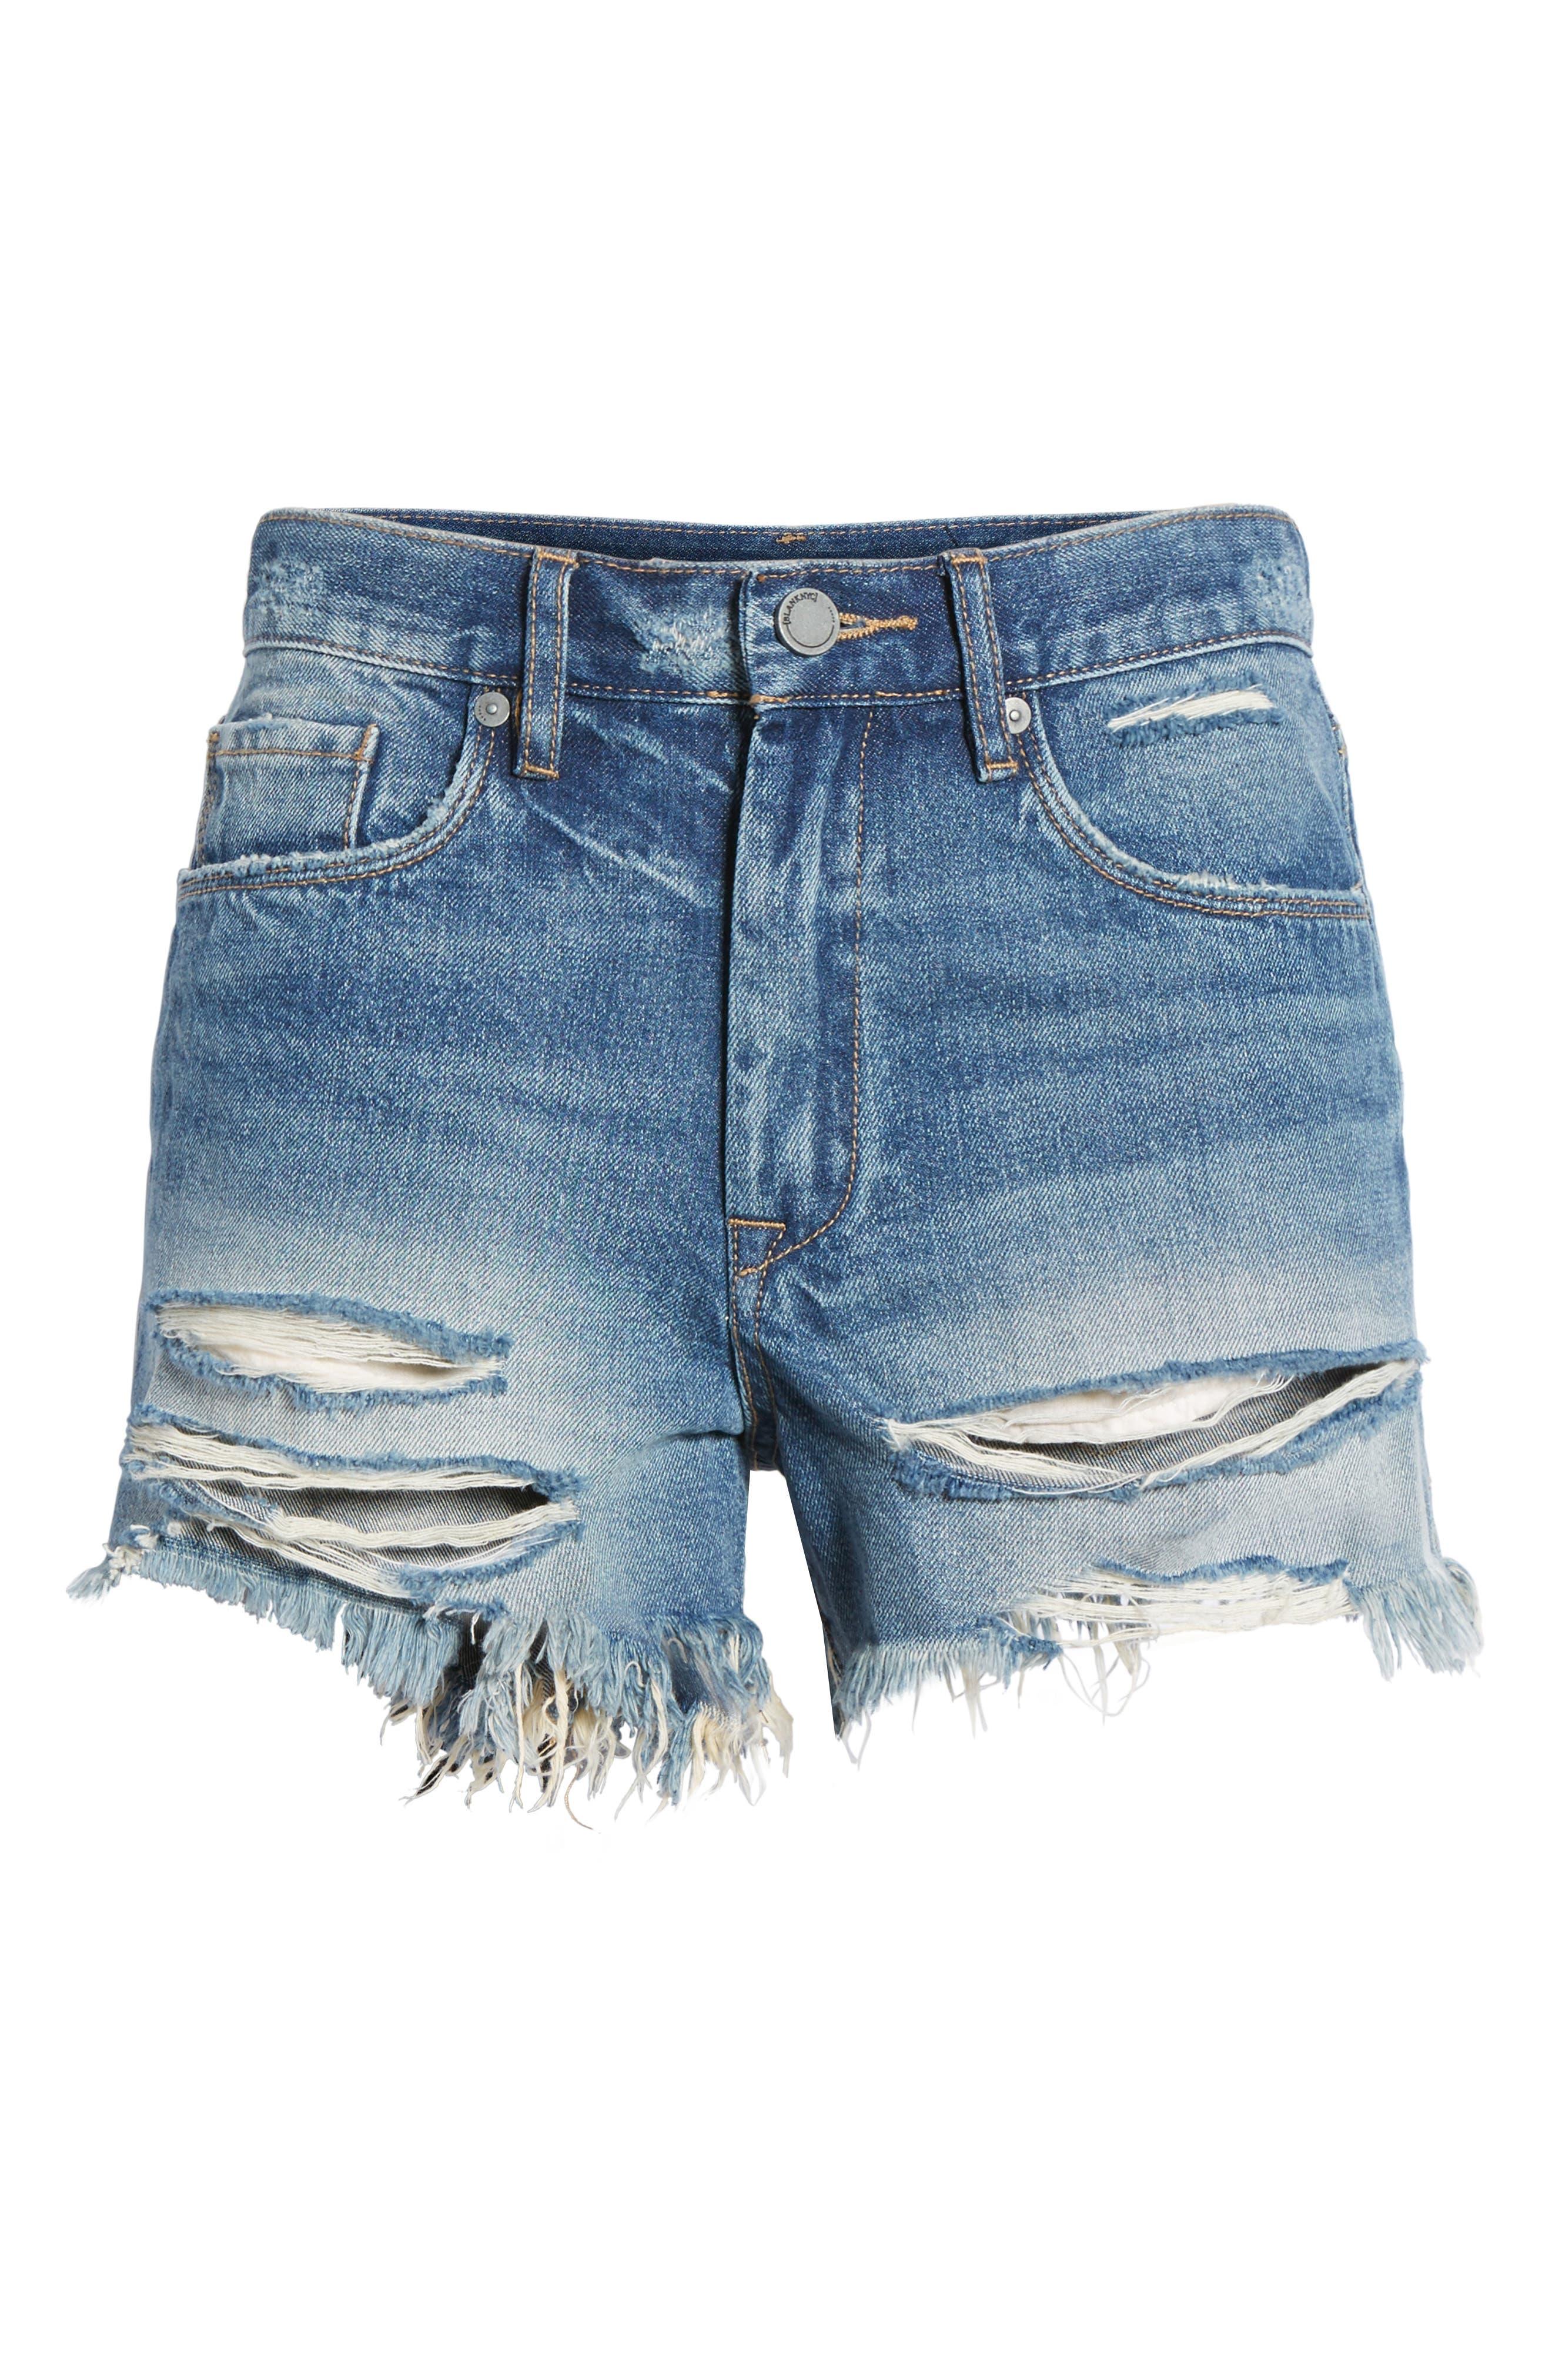 Pin-Up Distressed Denim Shorts,                             Alternate thumbnail 6, color,                             400